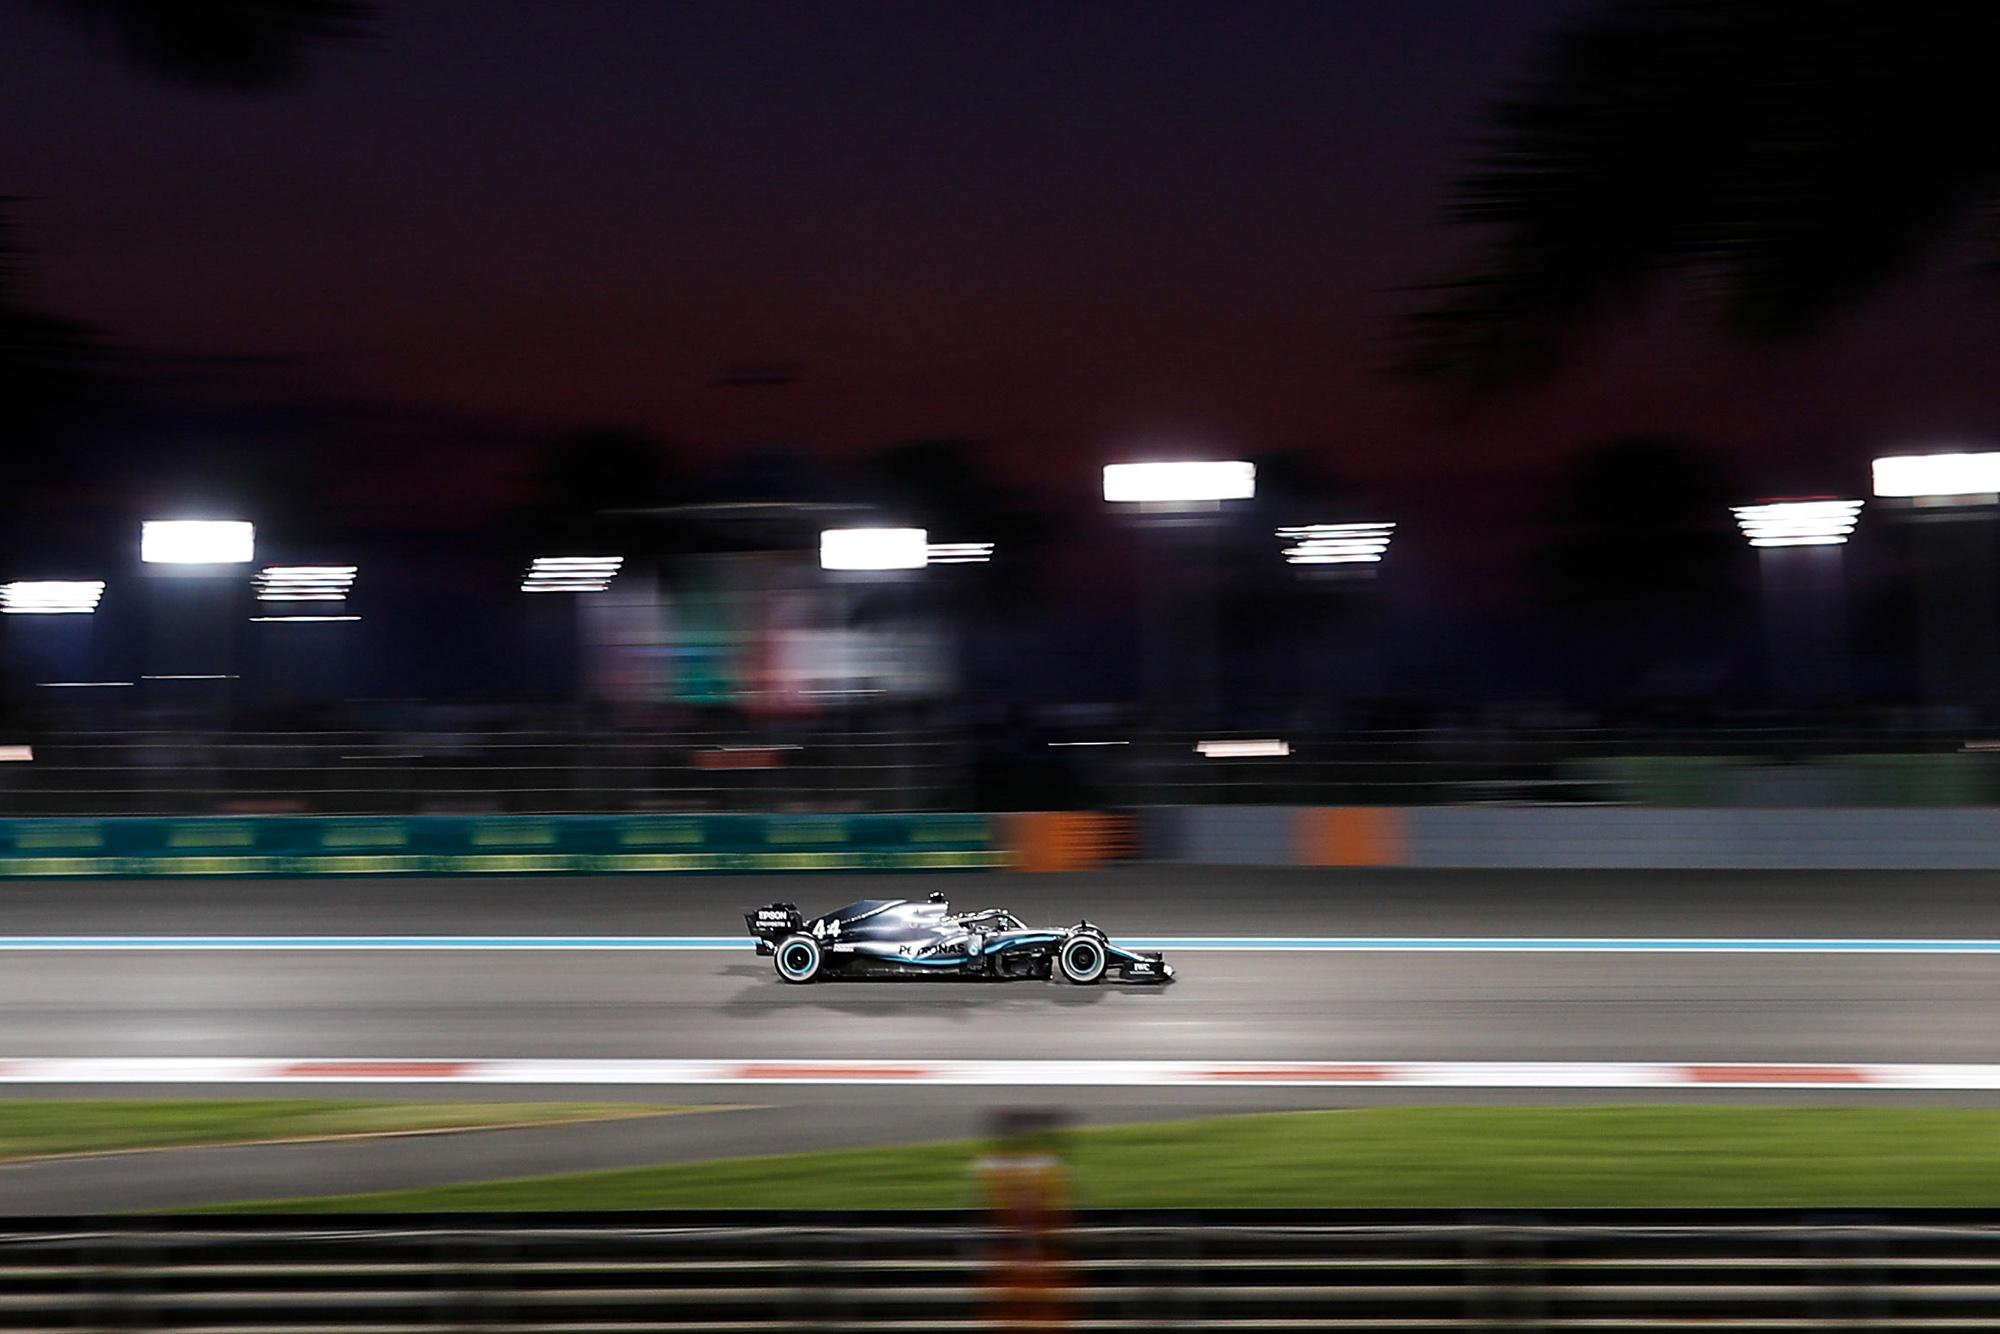 Lewis Hamilton during the 2019 Abu Dhabi Grand Prix